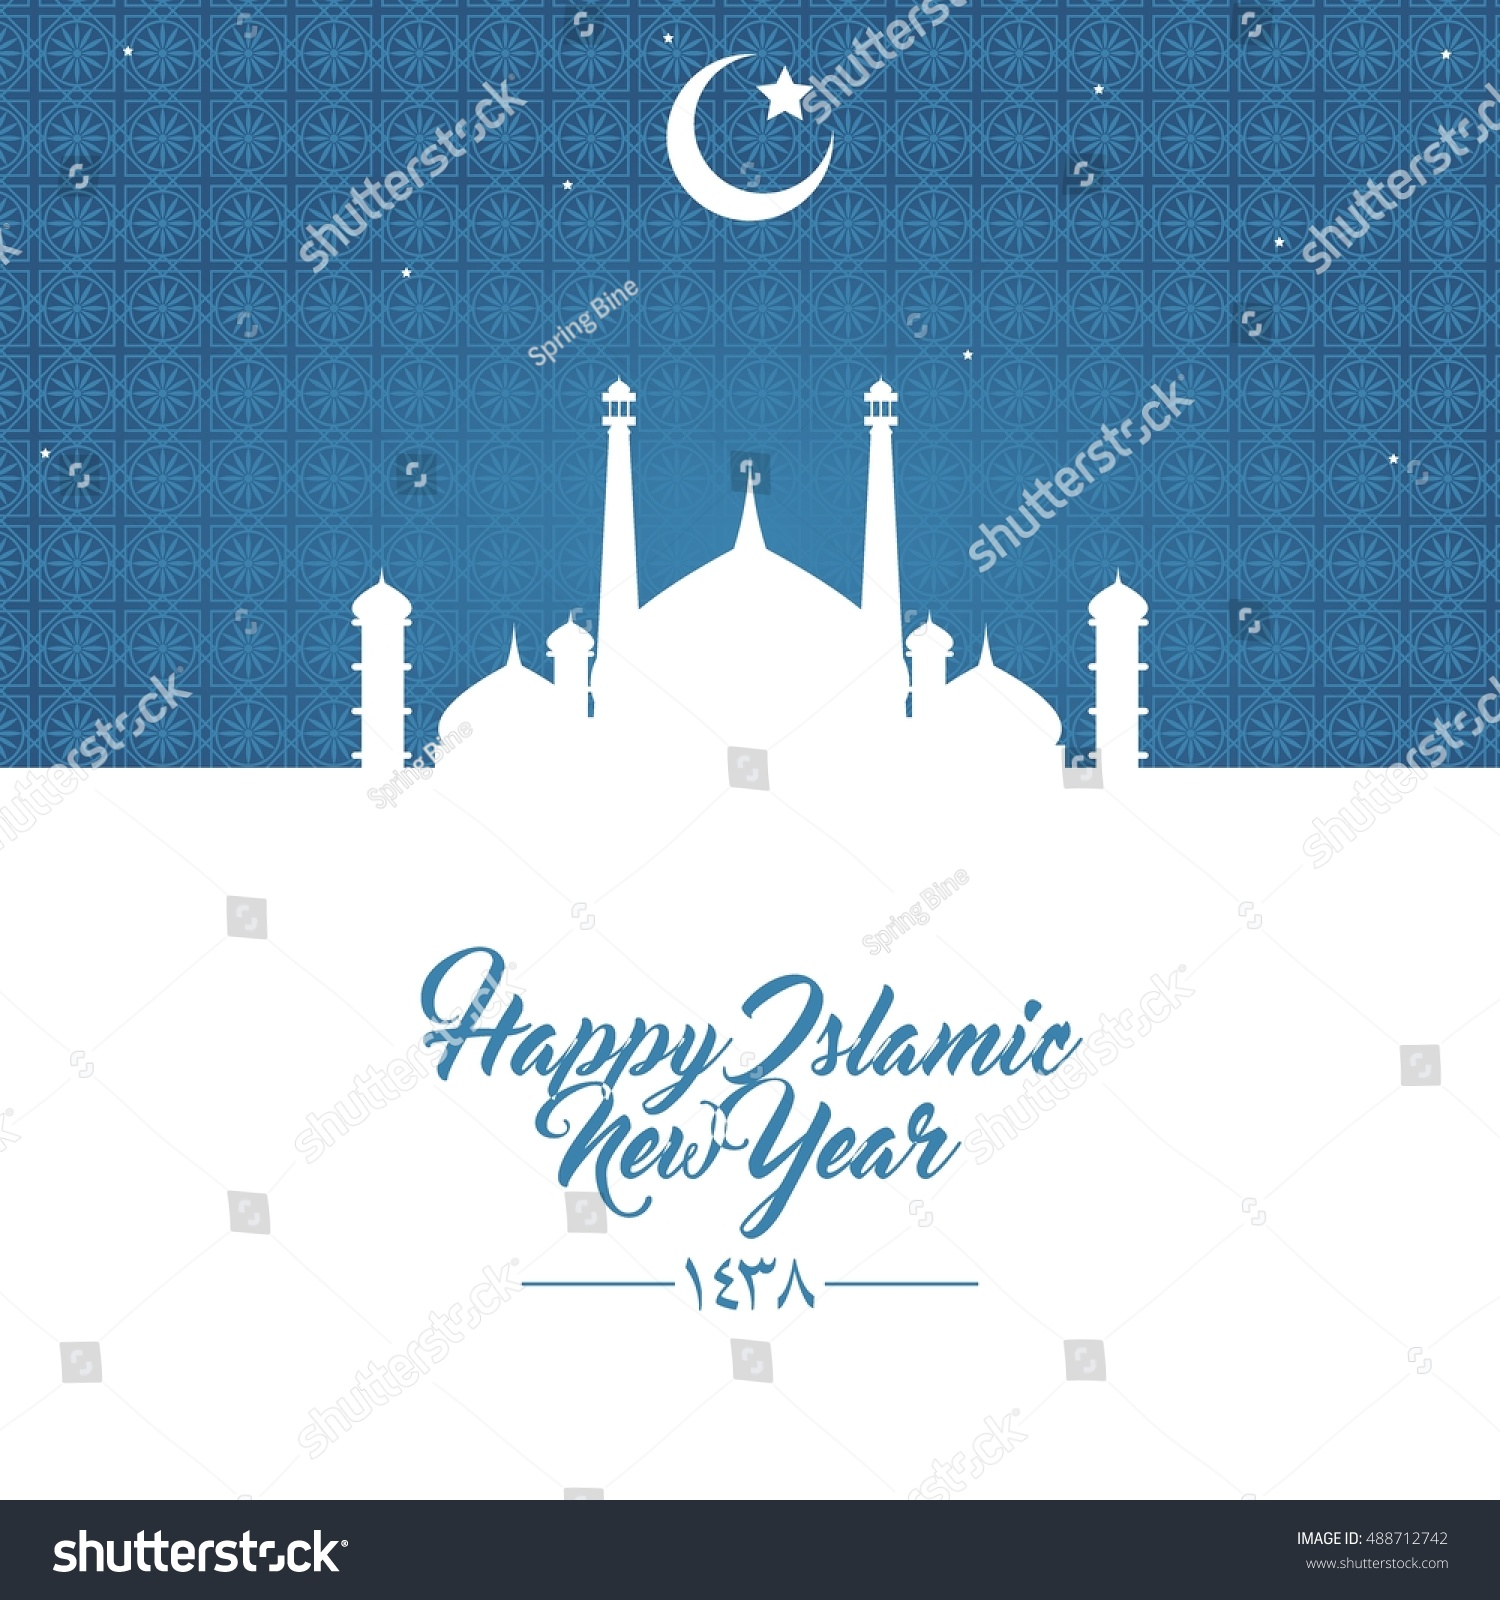 Happy new hijri year 1438 happy immagine vettoriale stock 488712742 happy new hijri year 1438 happy new year for all muslim community happy islamic kristyandbryce Images